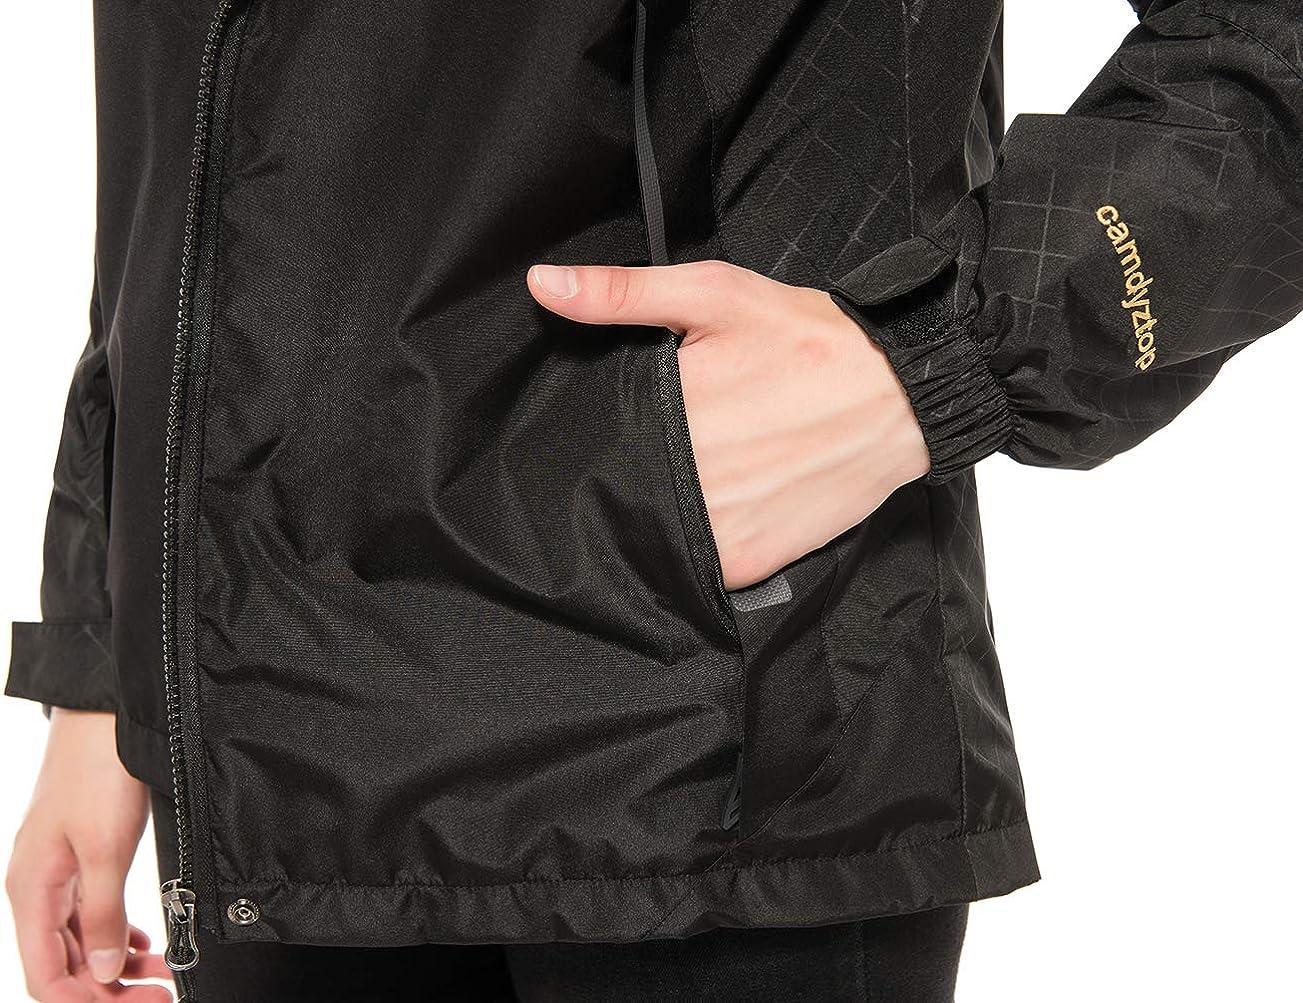 Diamond Candy Womens Waterproof Jacket Outdoor Hooded Raincoat